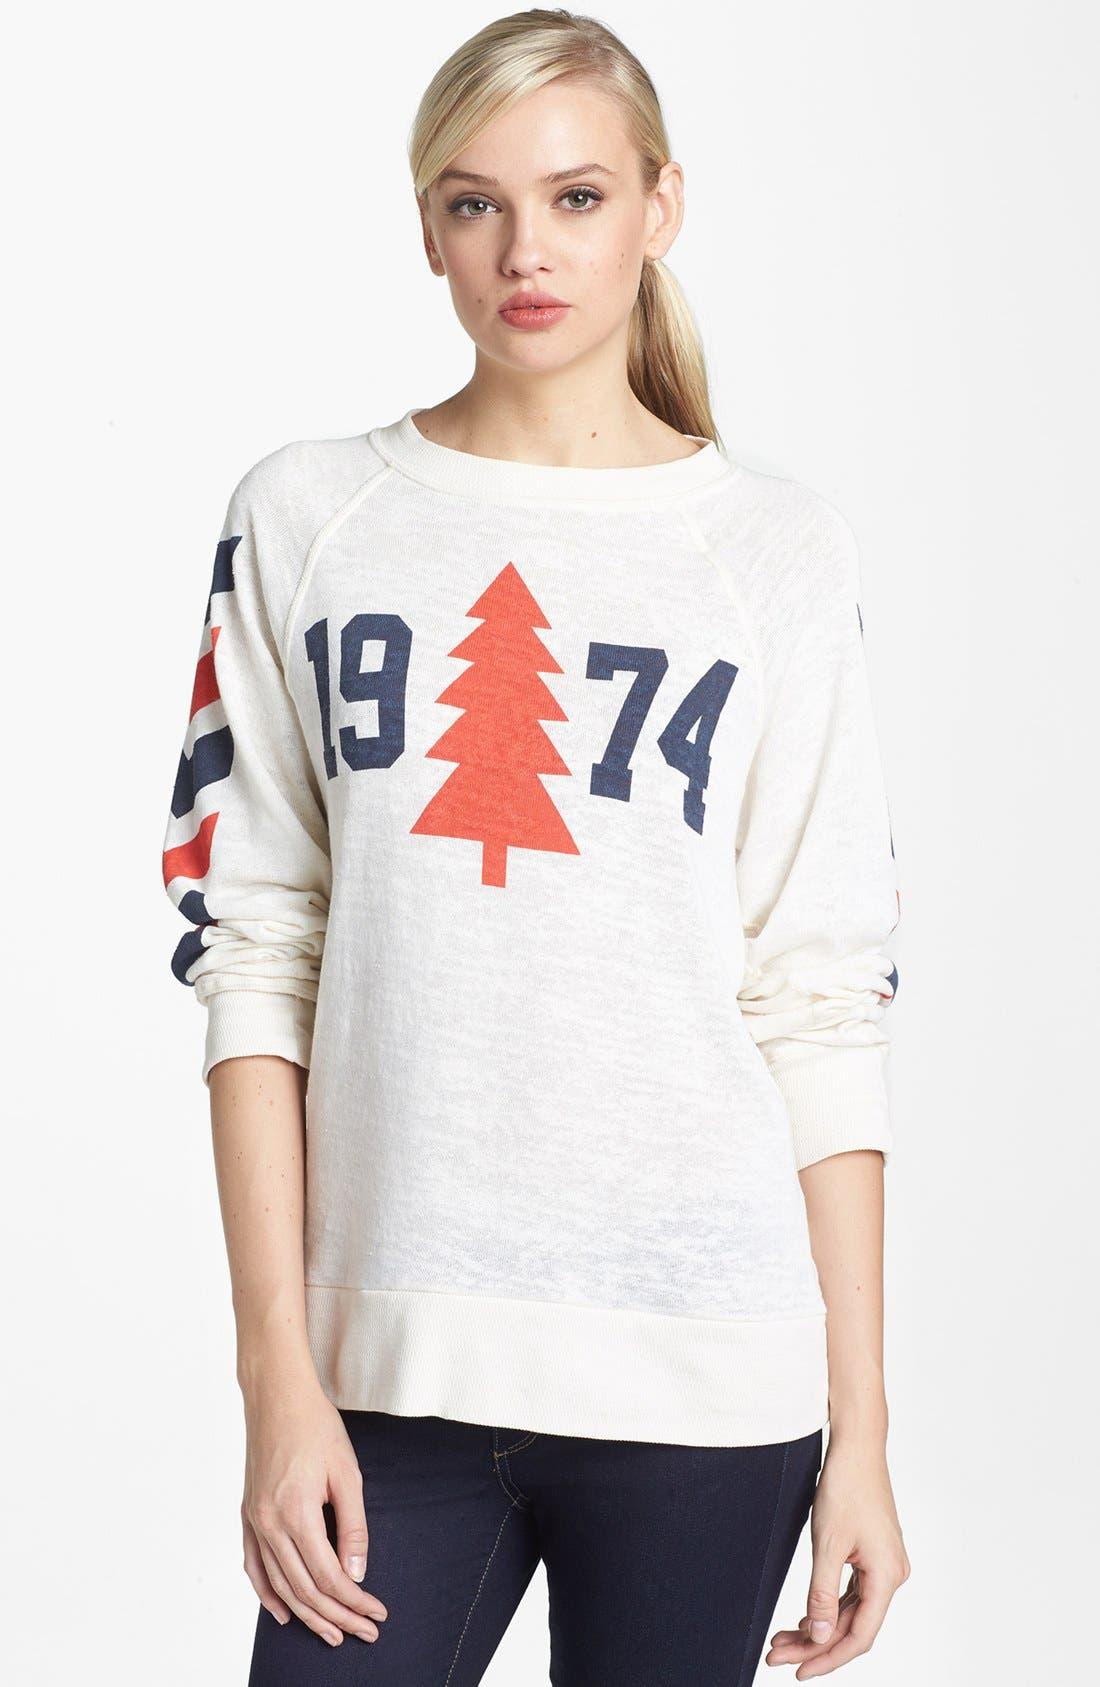 '1974 Nantucket' Sweatshirt,                         Main,                         color, 110